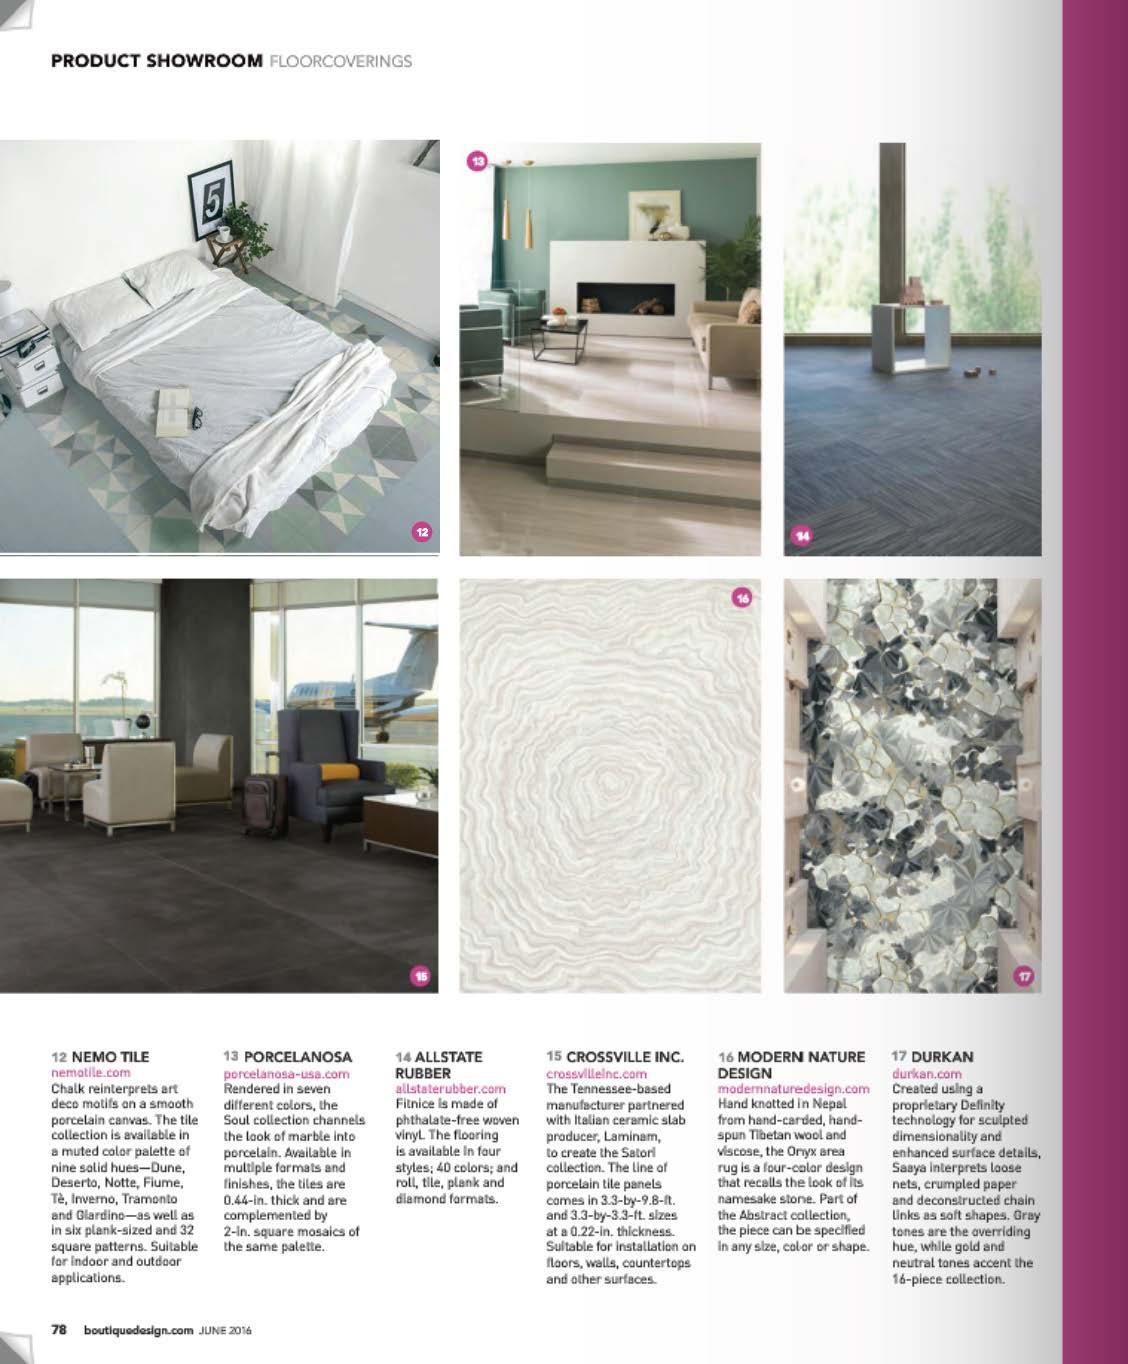 Boutique Design Chalk Feature | Press | Nemo Tile & Stone